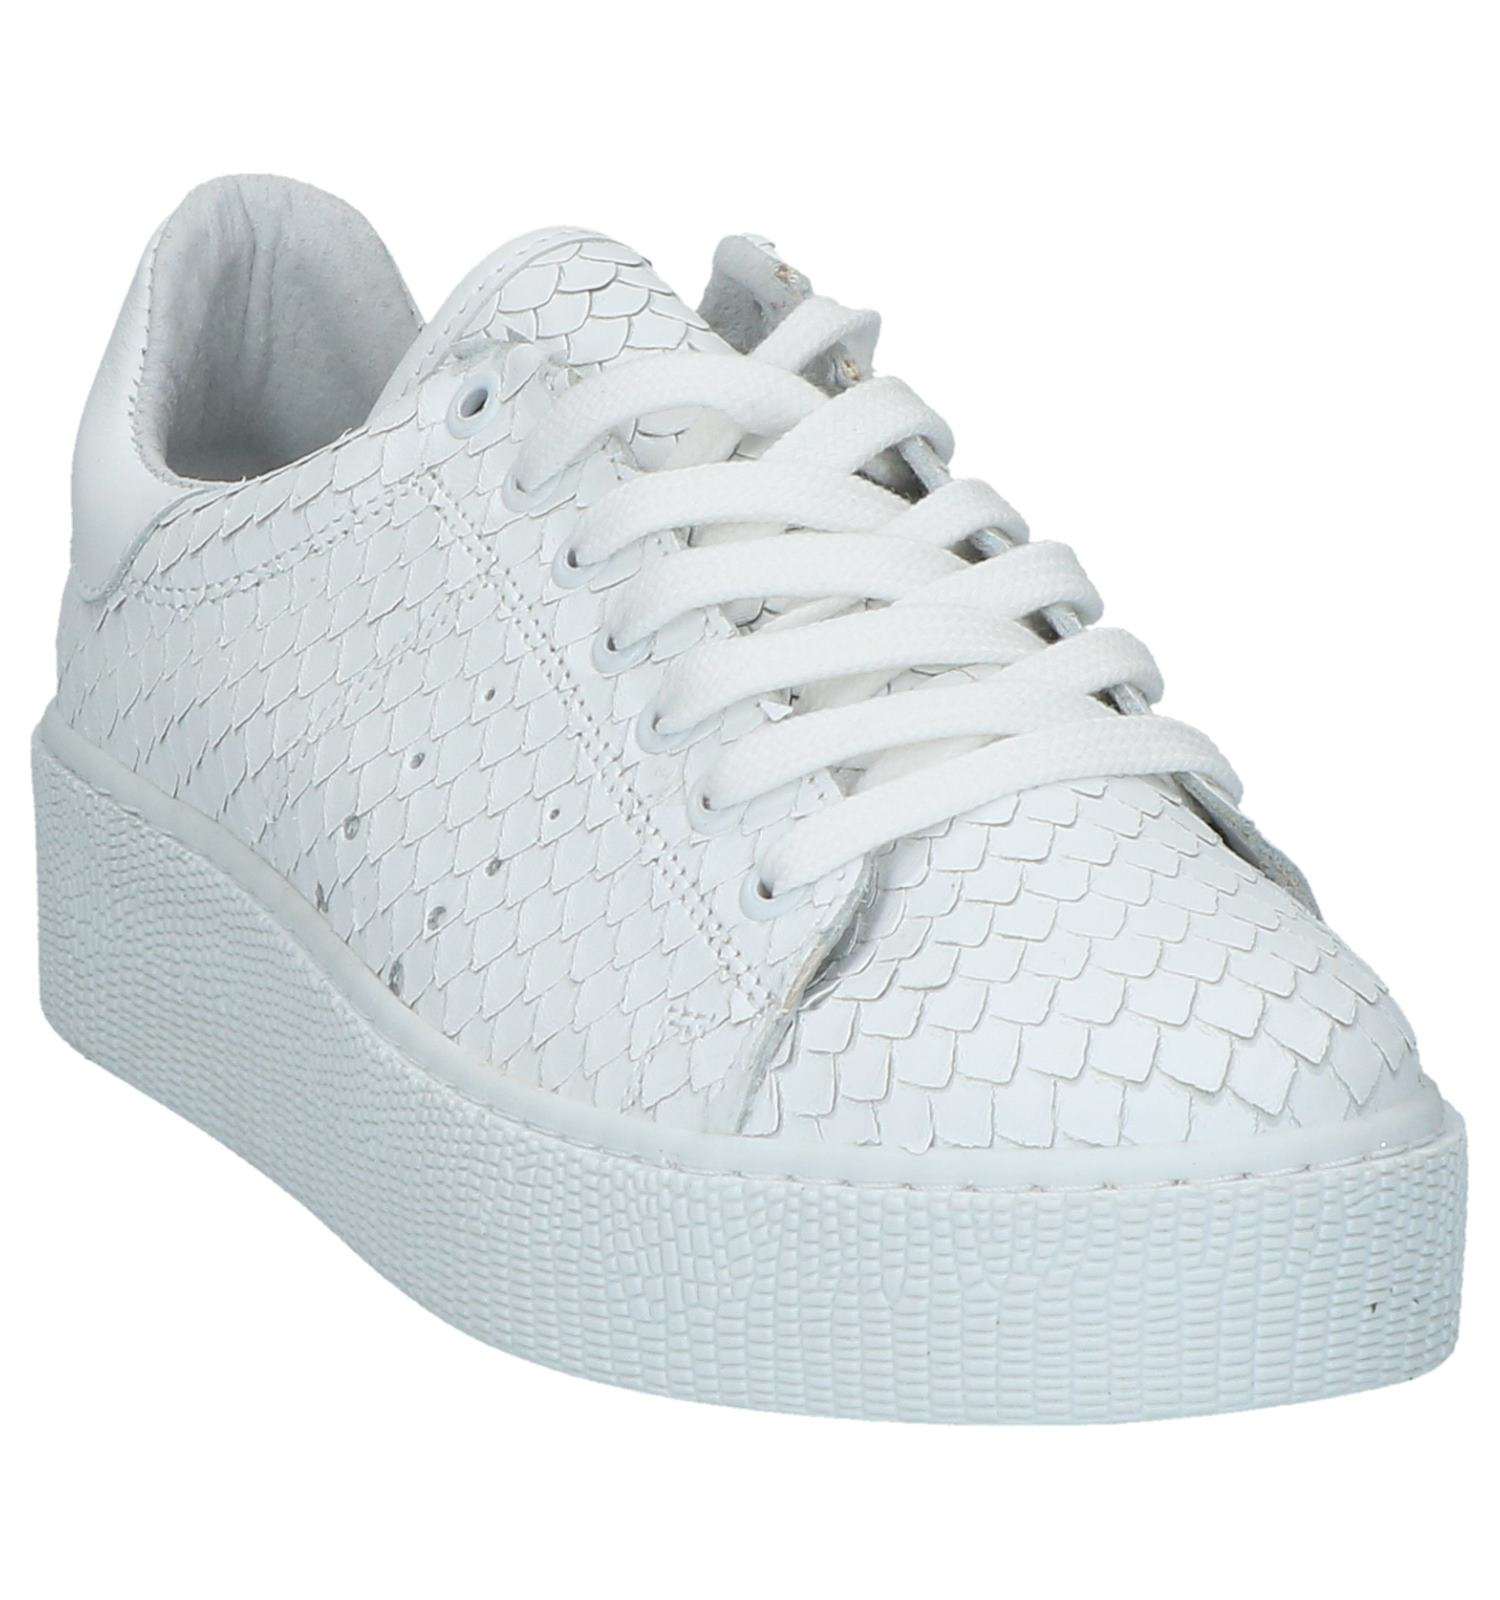 Sneakers Torfs Gratis Chantal Verzend be En Plateau Tango Witte qvxOTtnB